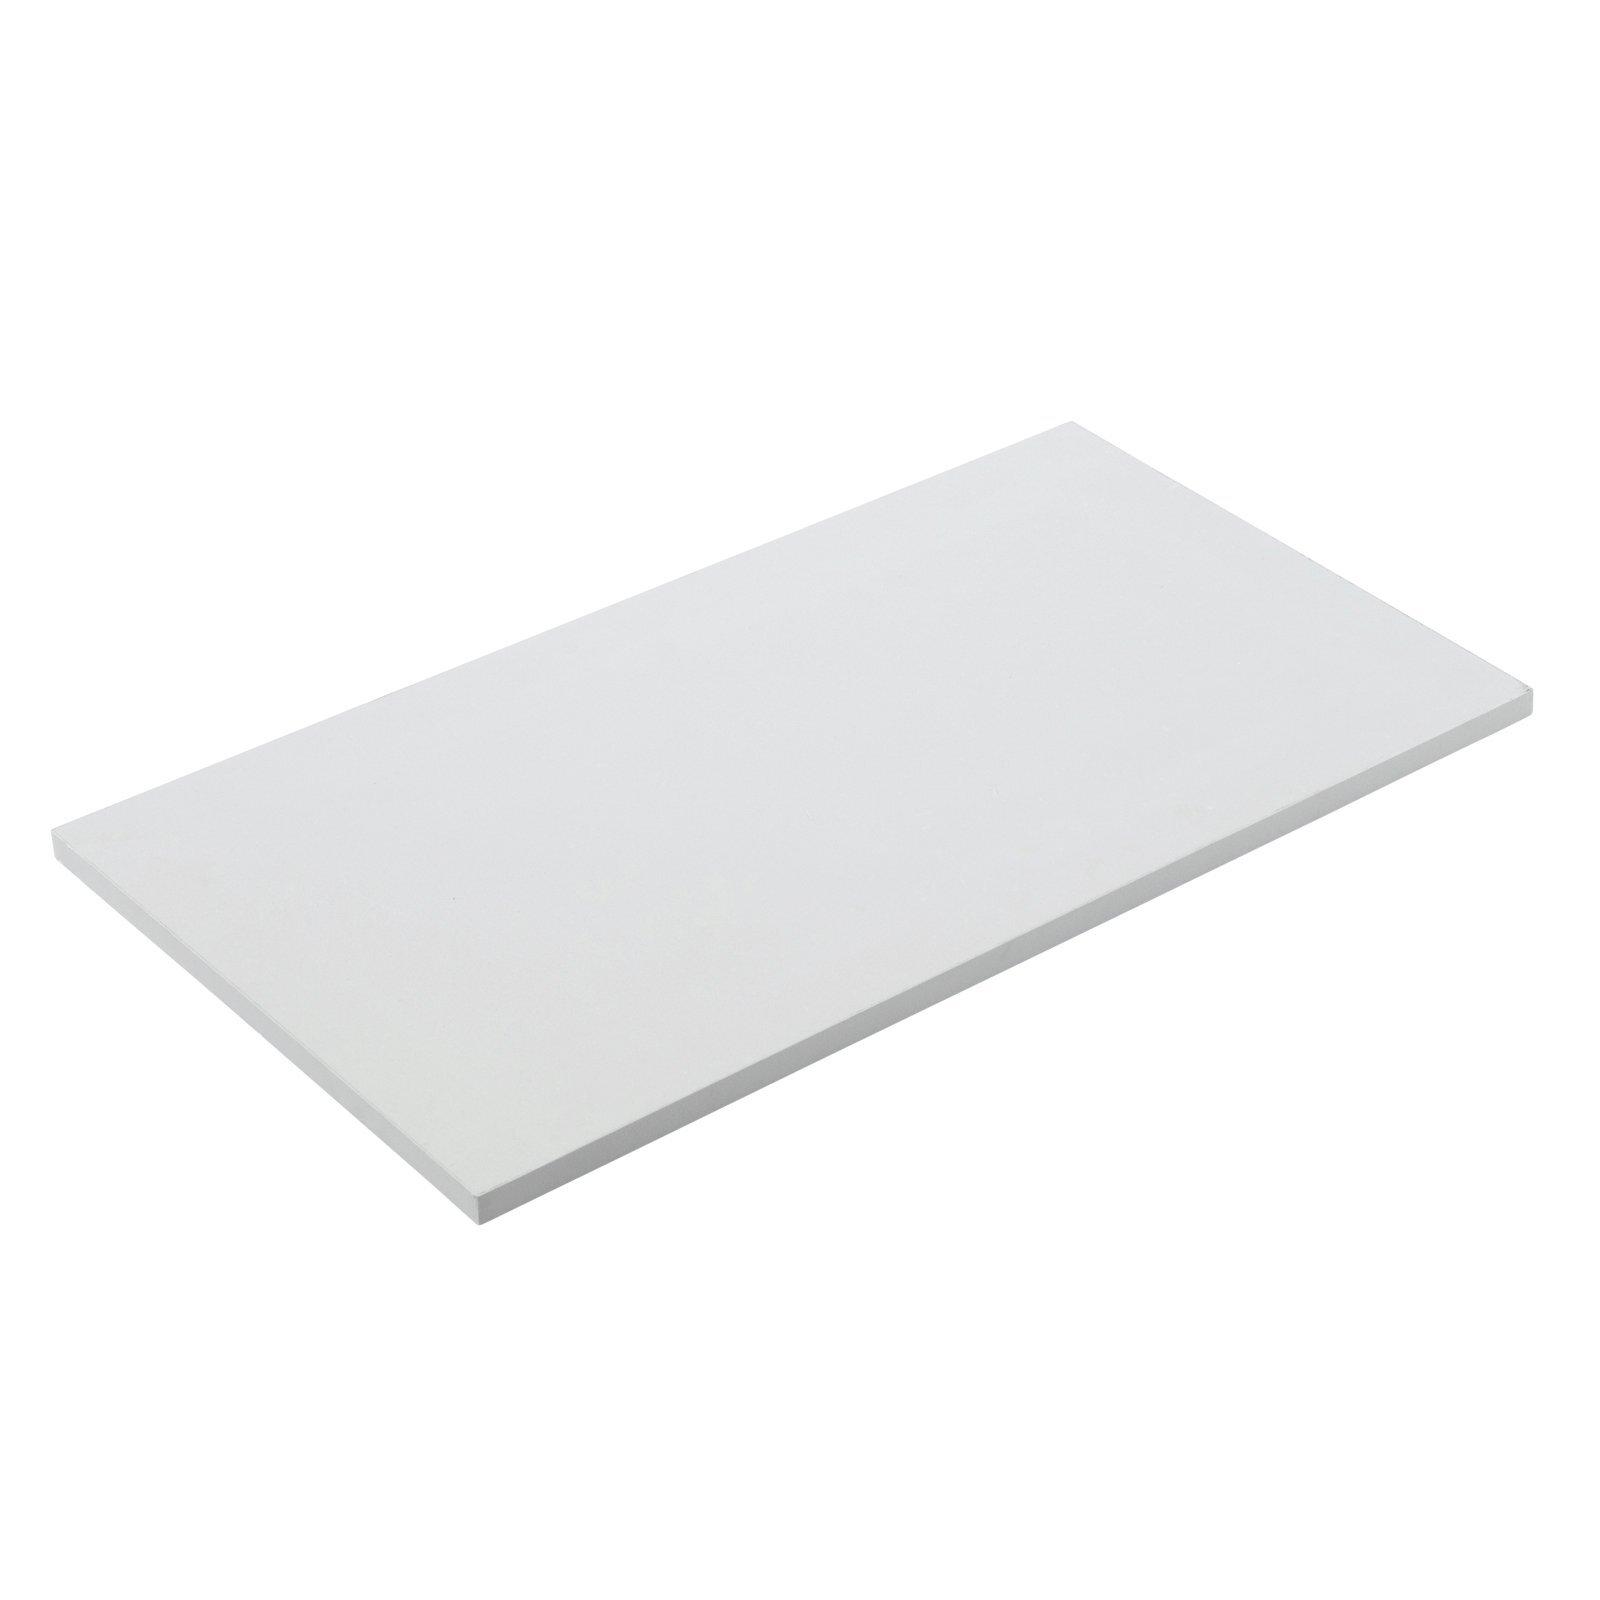 Flexi Storage Home Solutions 596 x 16 x 360mm White Shelf